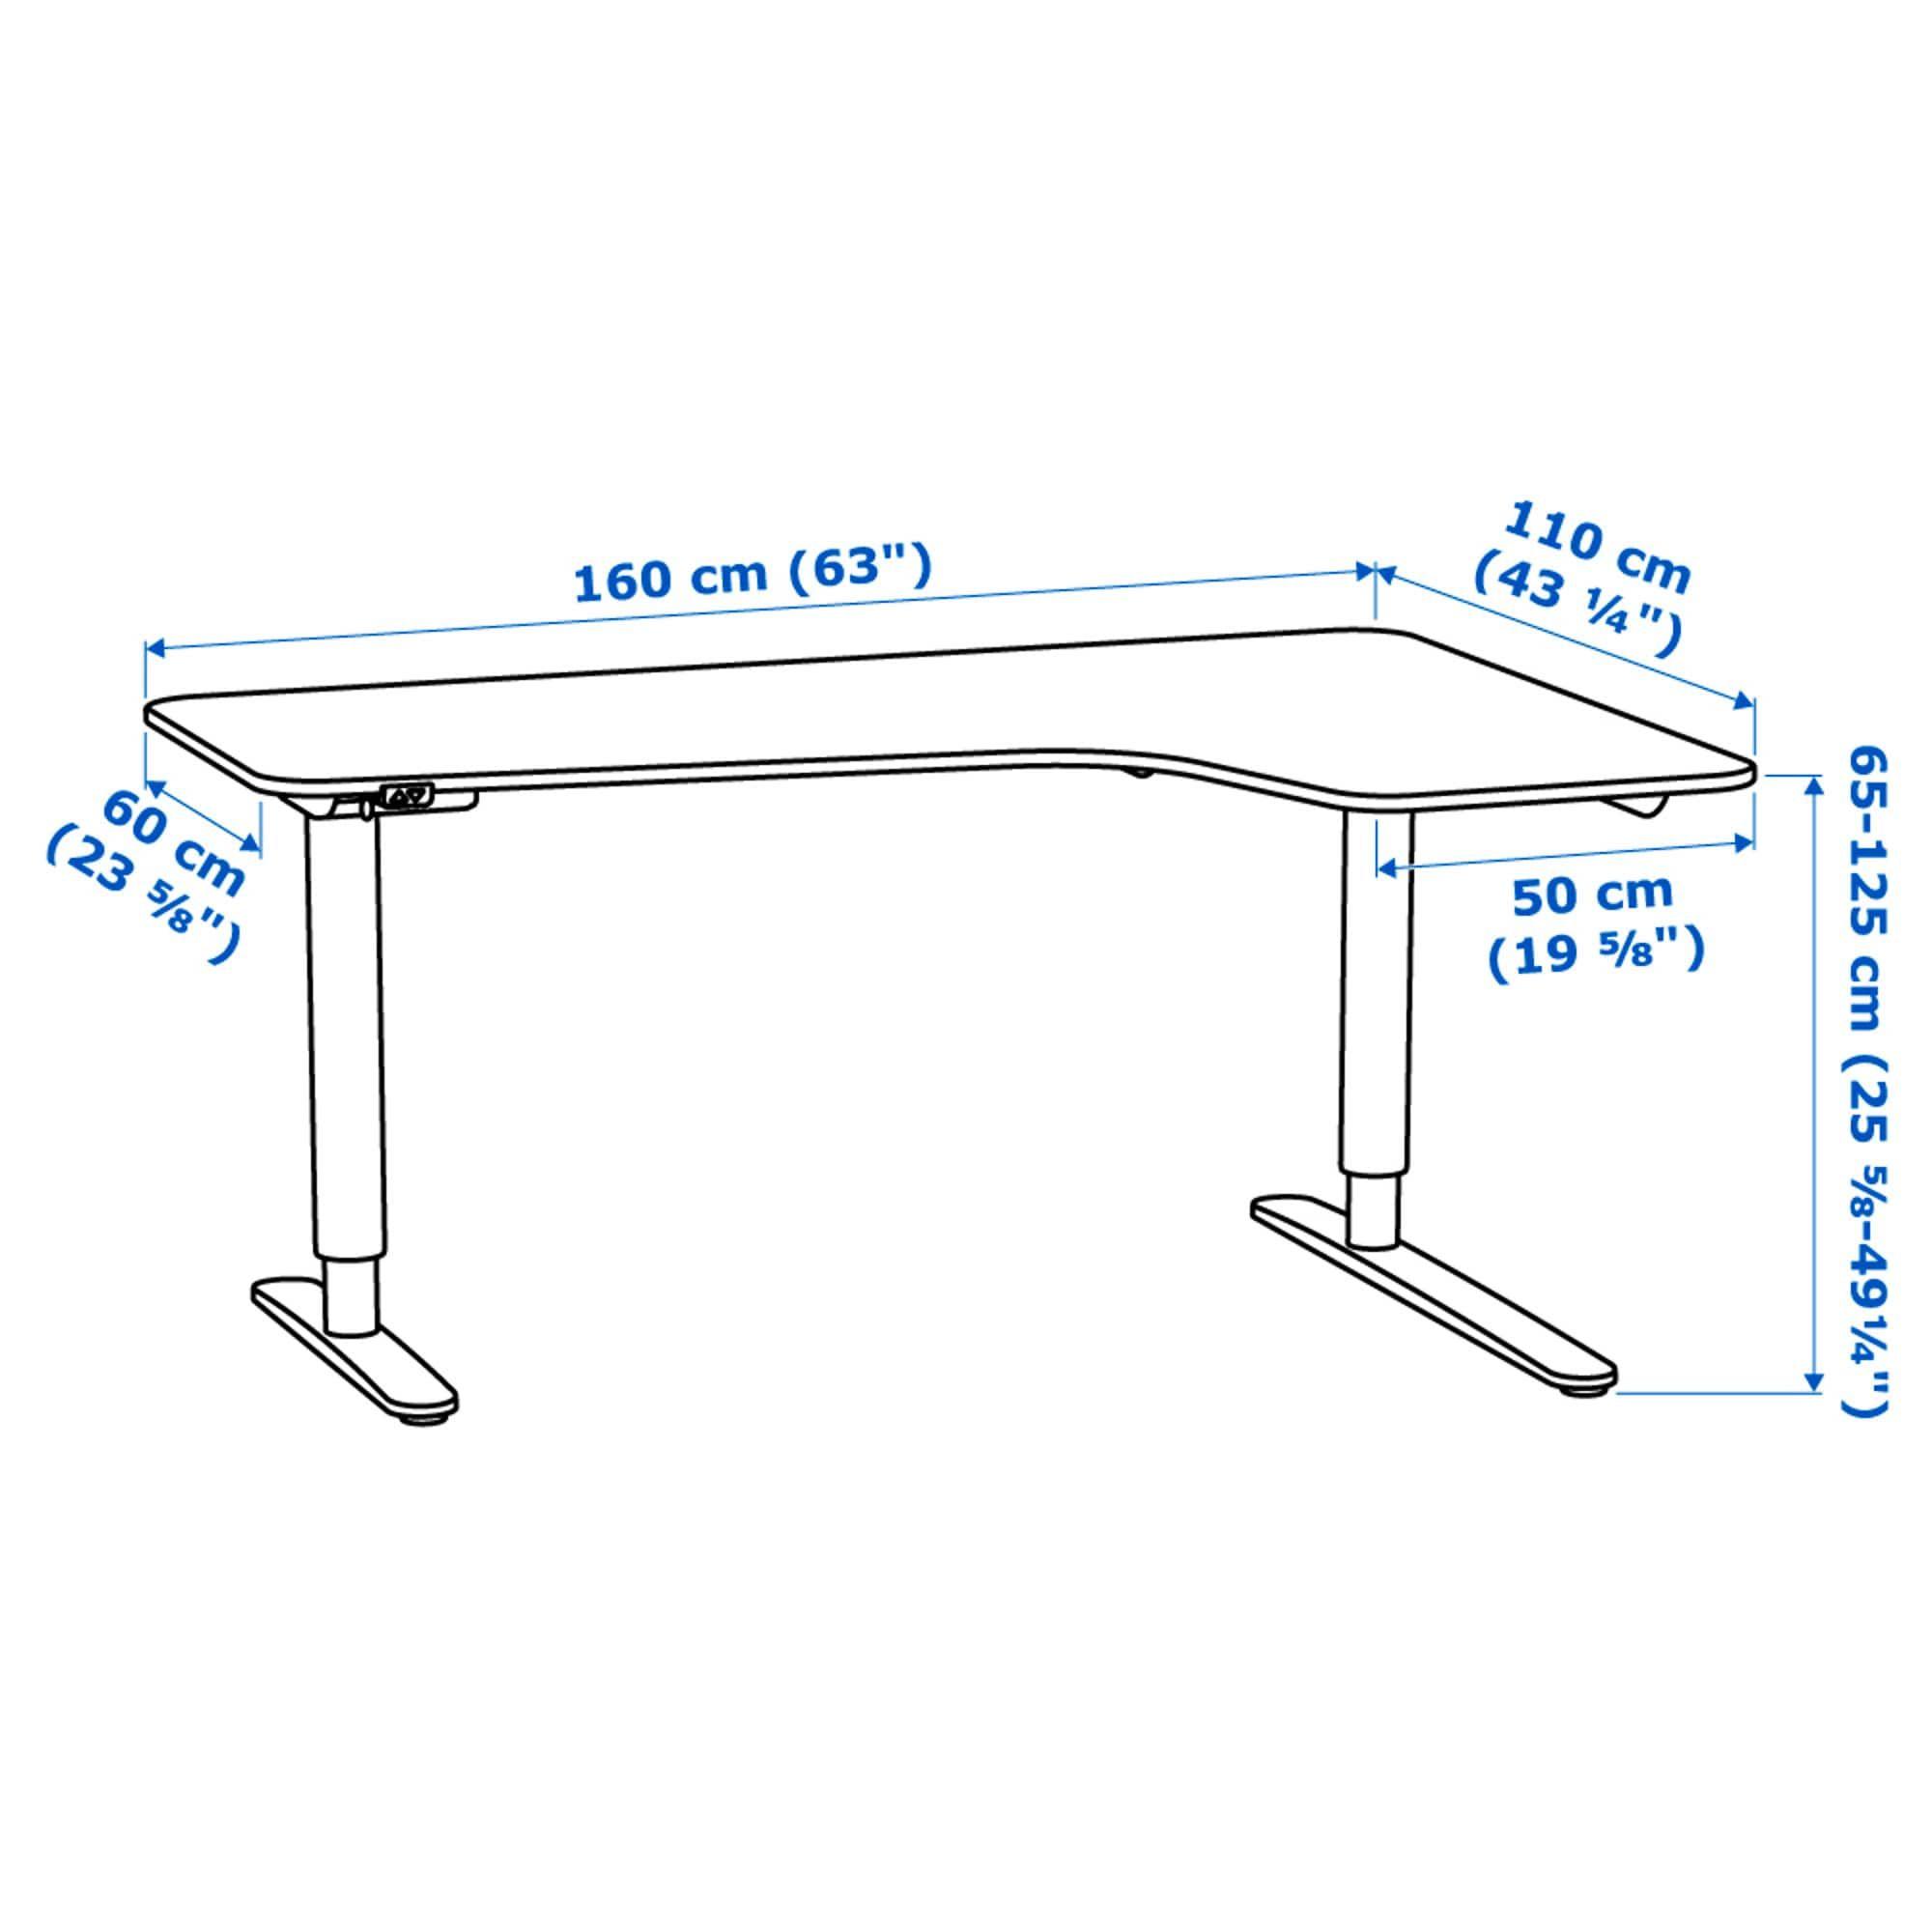 Ikea Bekant Corner Desk Dimensions Google Search Ikea Bekant Desk Dimensions Ikea Galant Desk